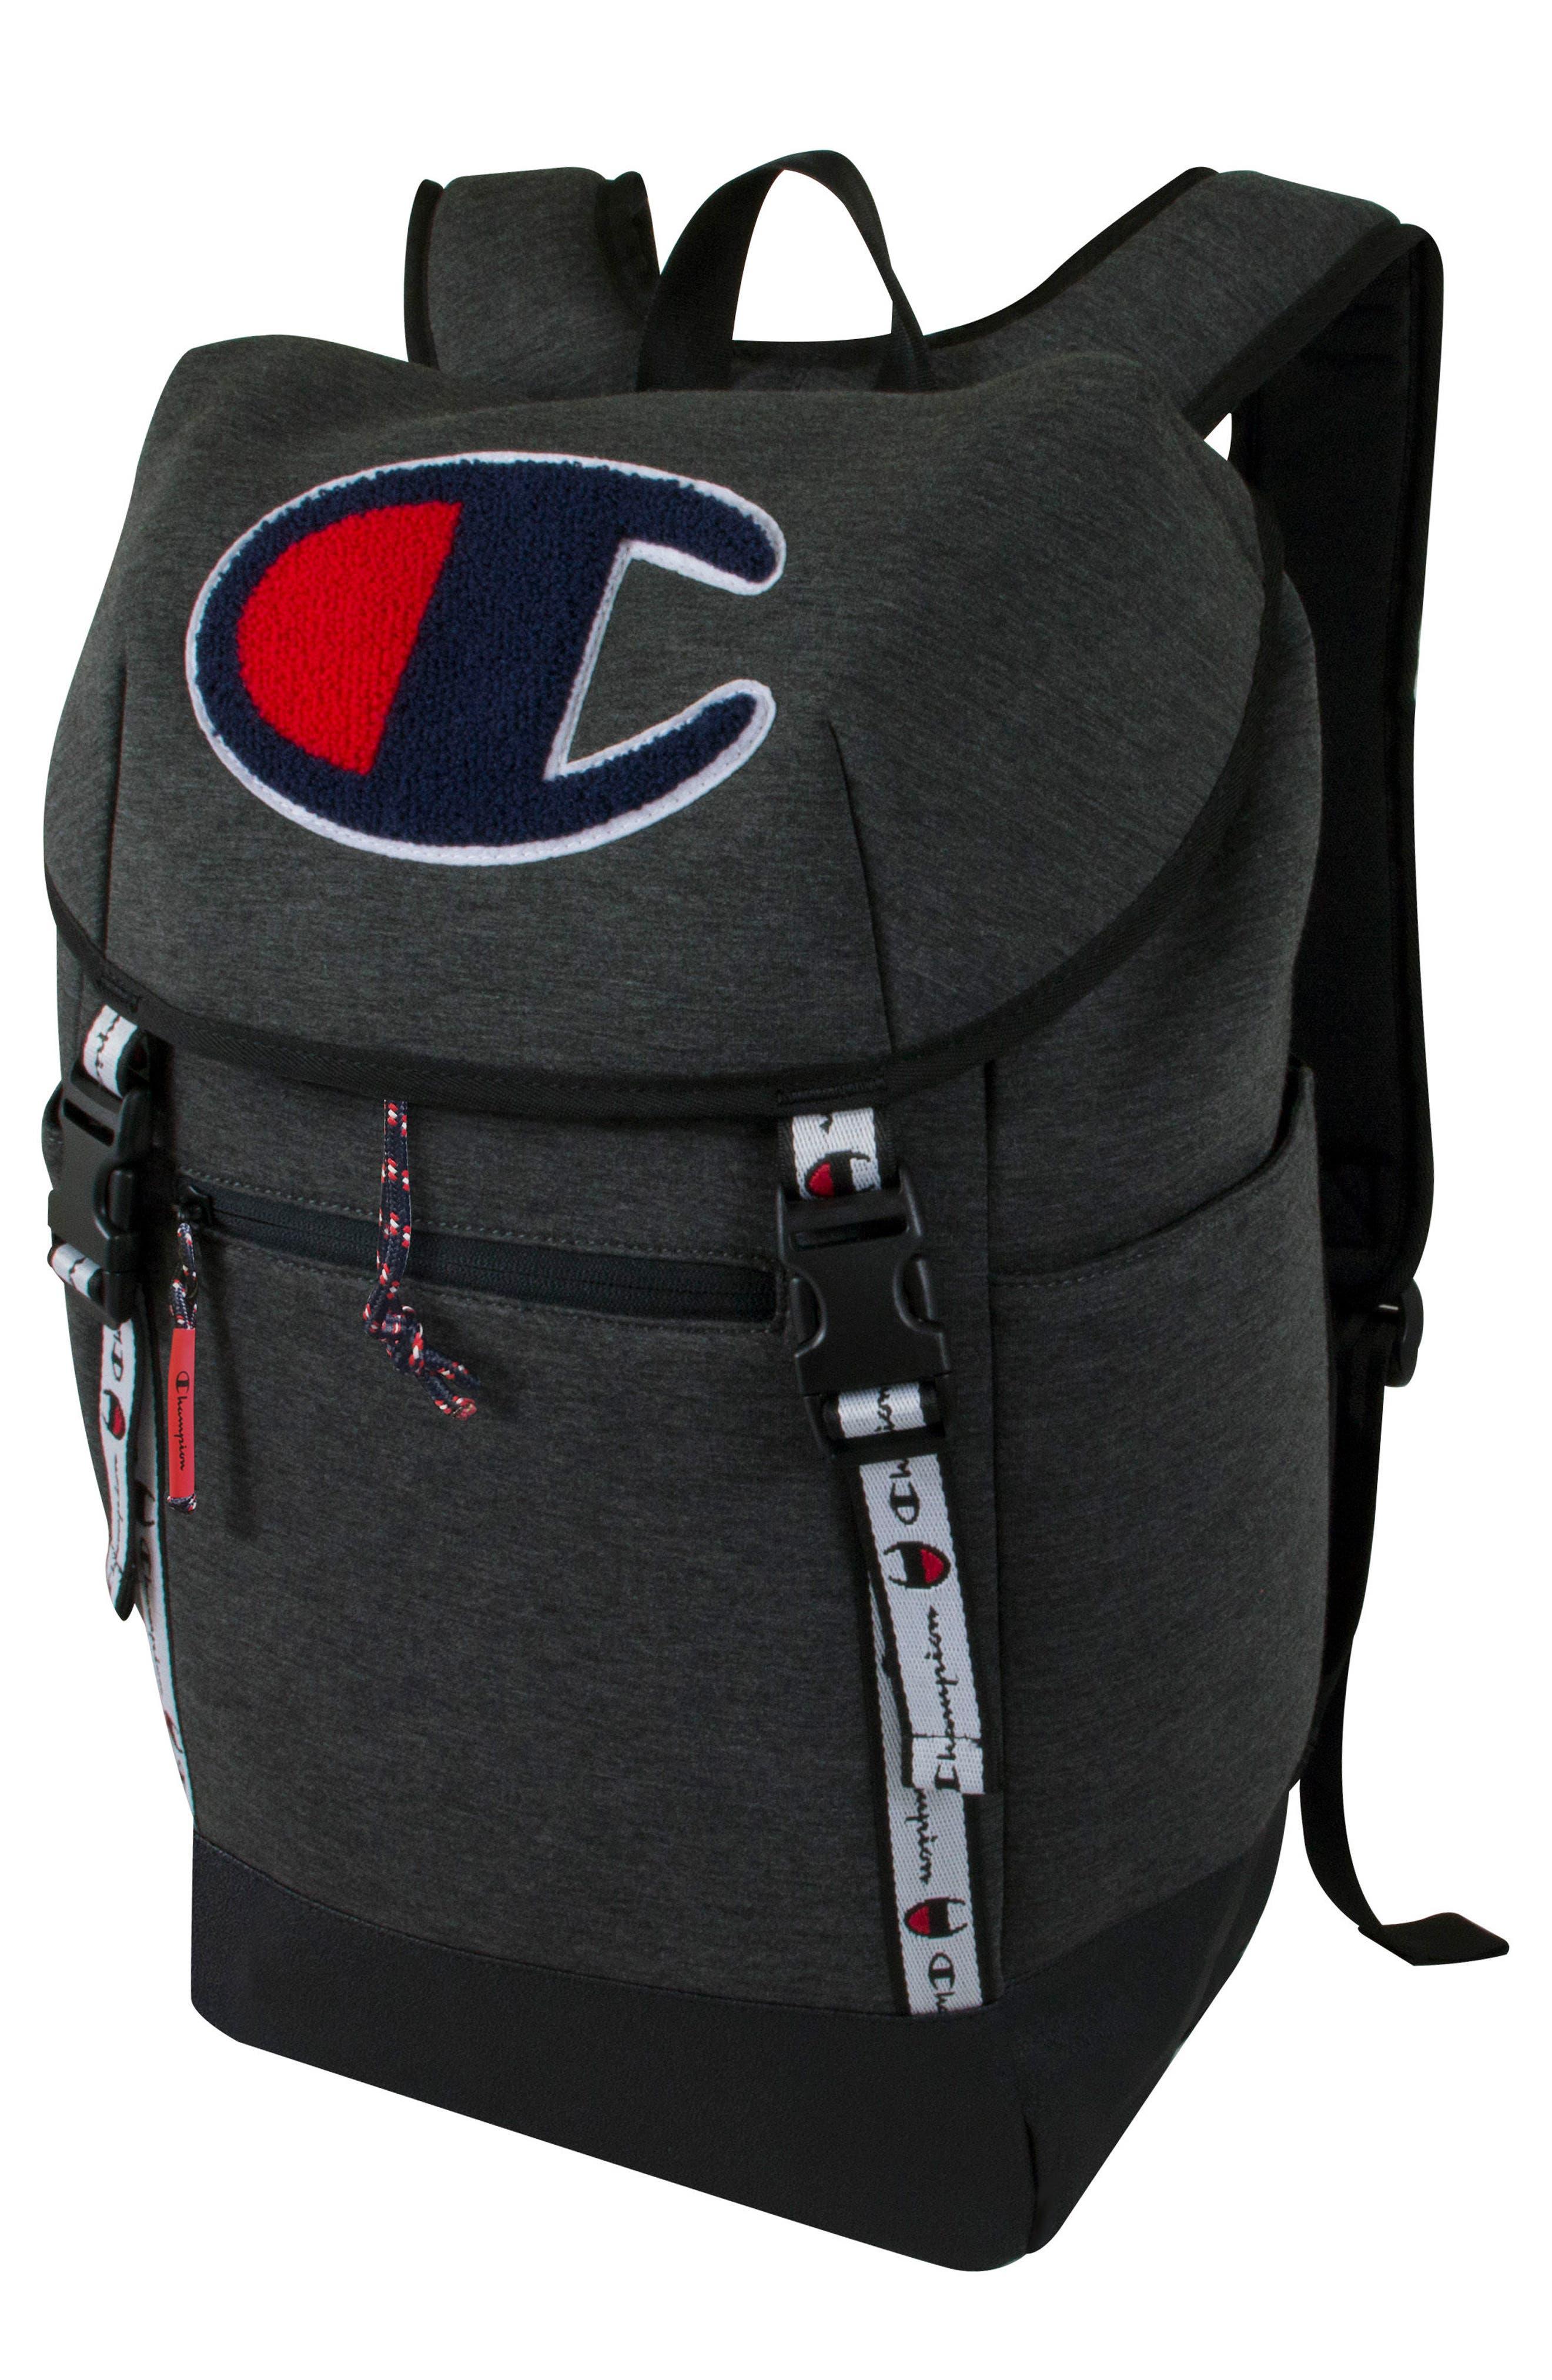 Top Load Backpack,                             Main thumbnail 1, color,                             Granite Heather